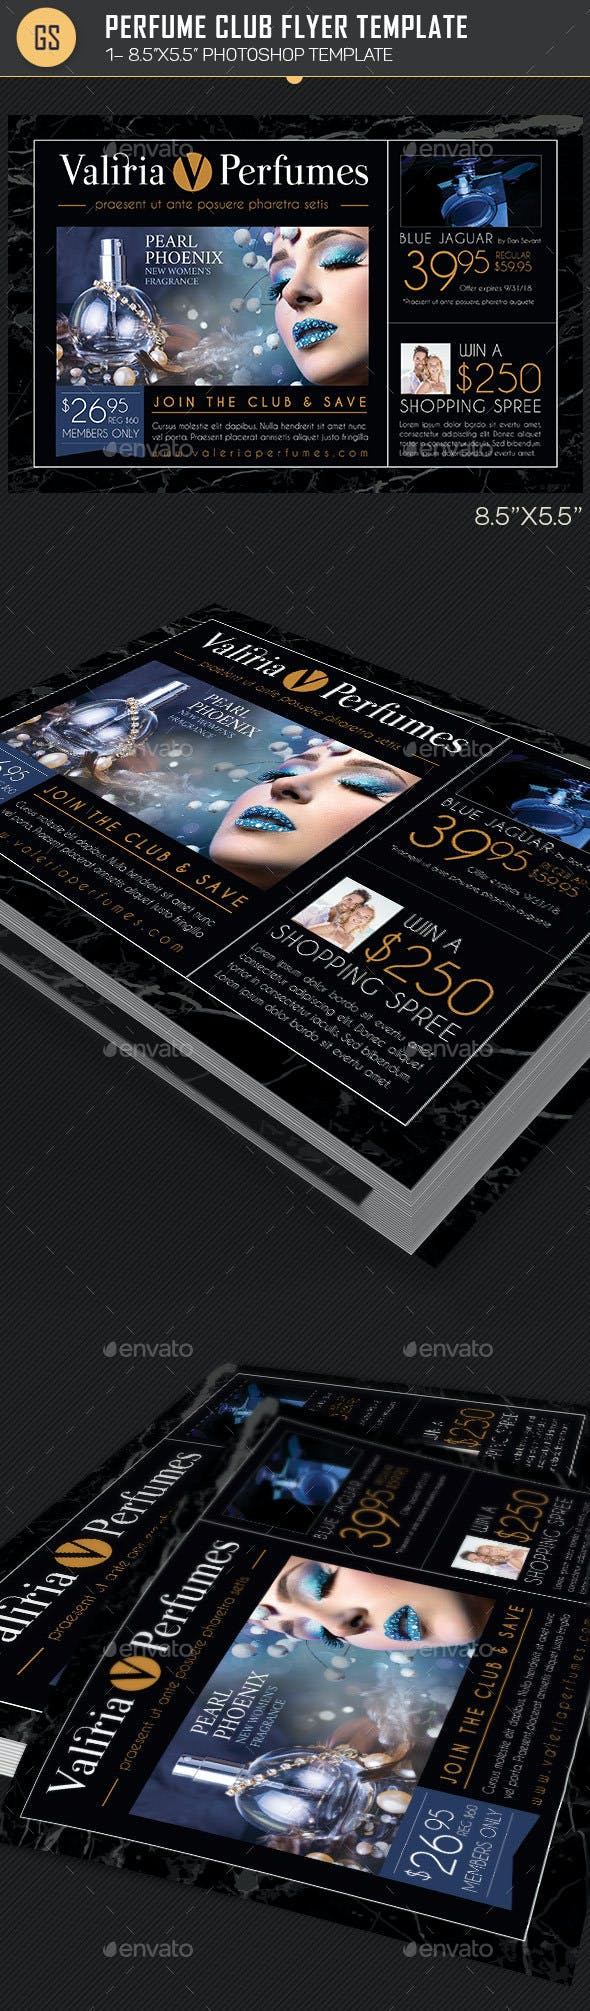 perfume club flyer template by godserv graphicriver